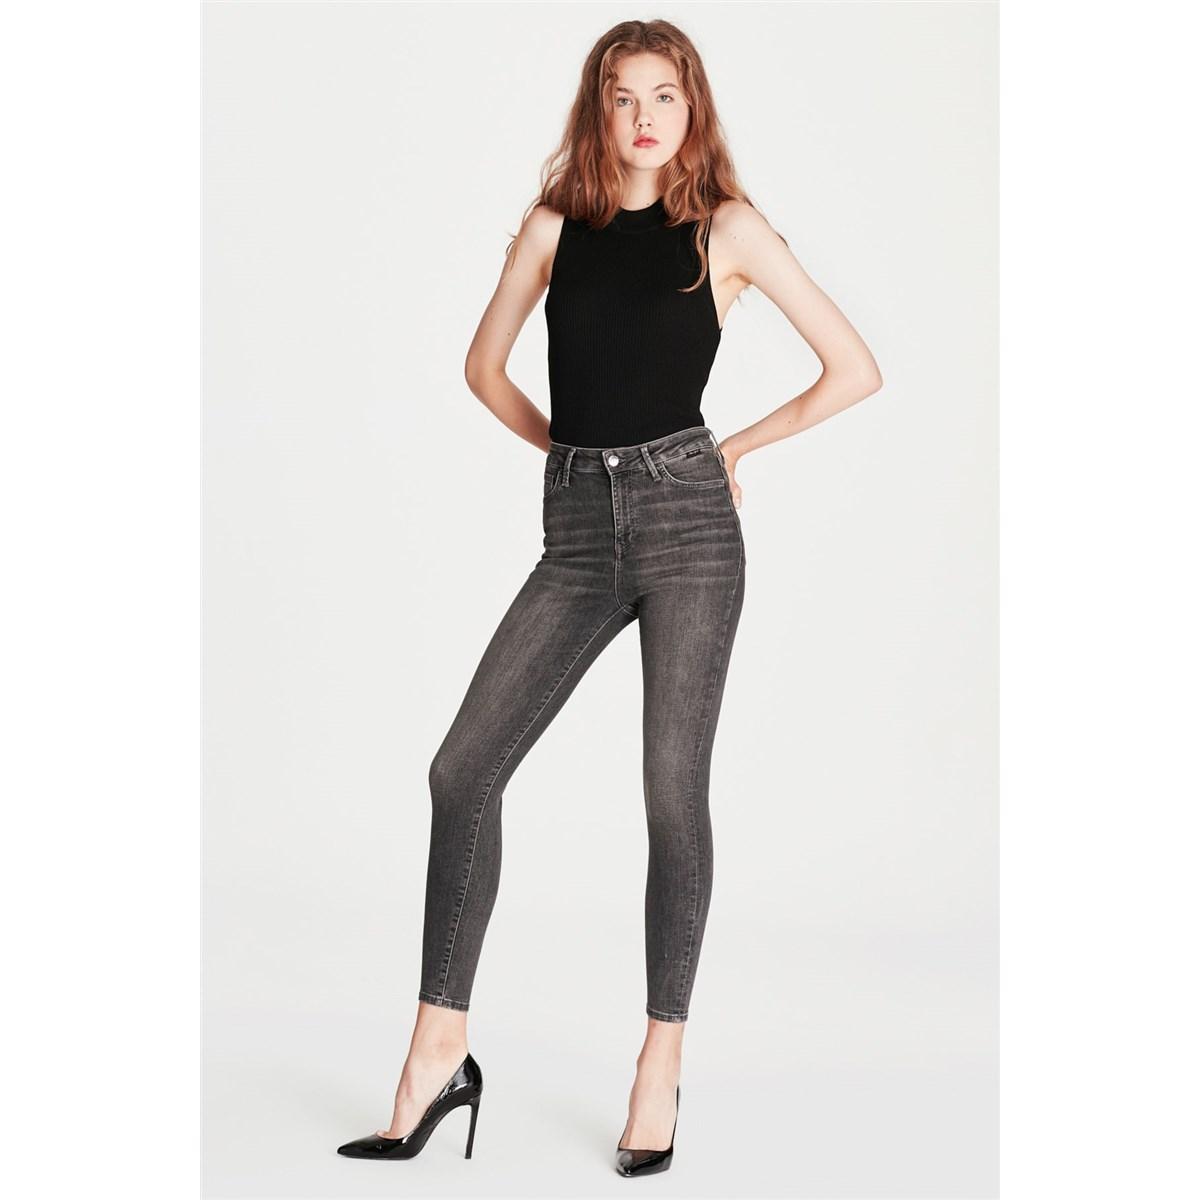 Mavi Jeans Serenay Kadın Gri Jean Pantolon